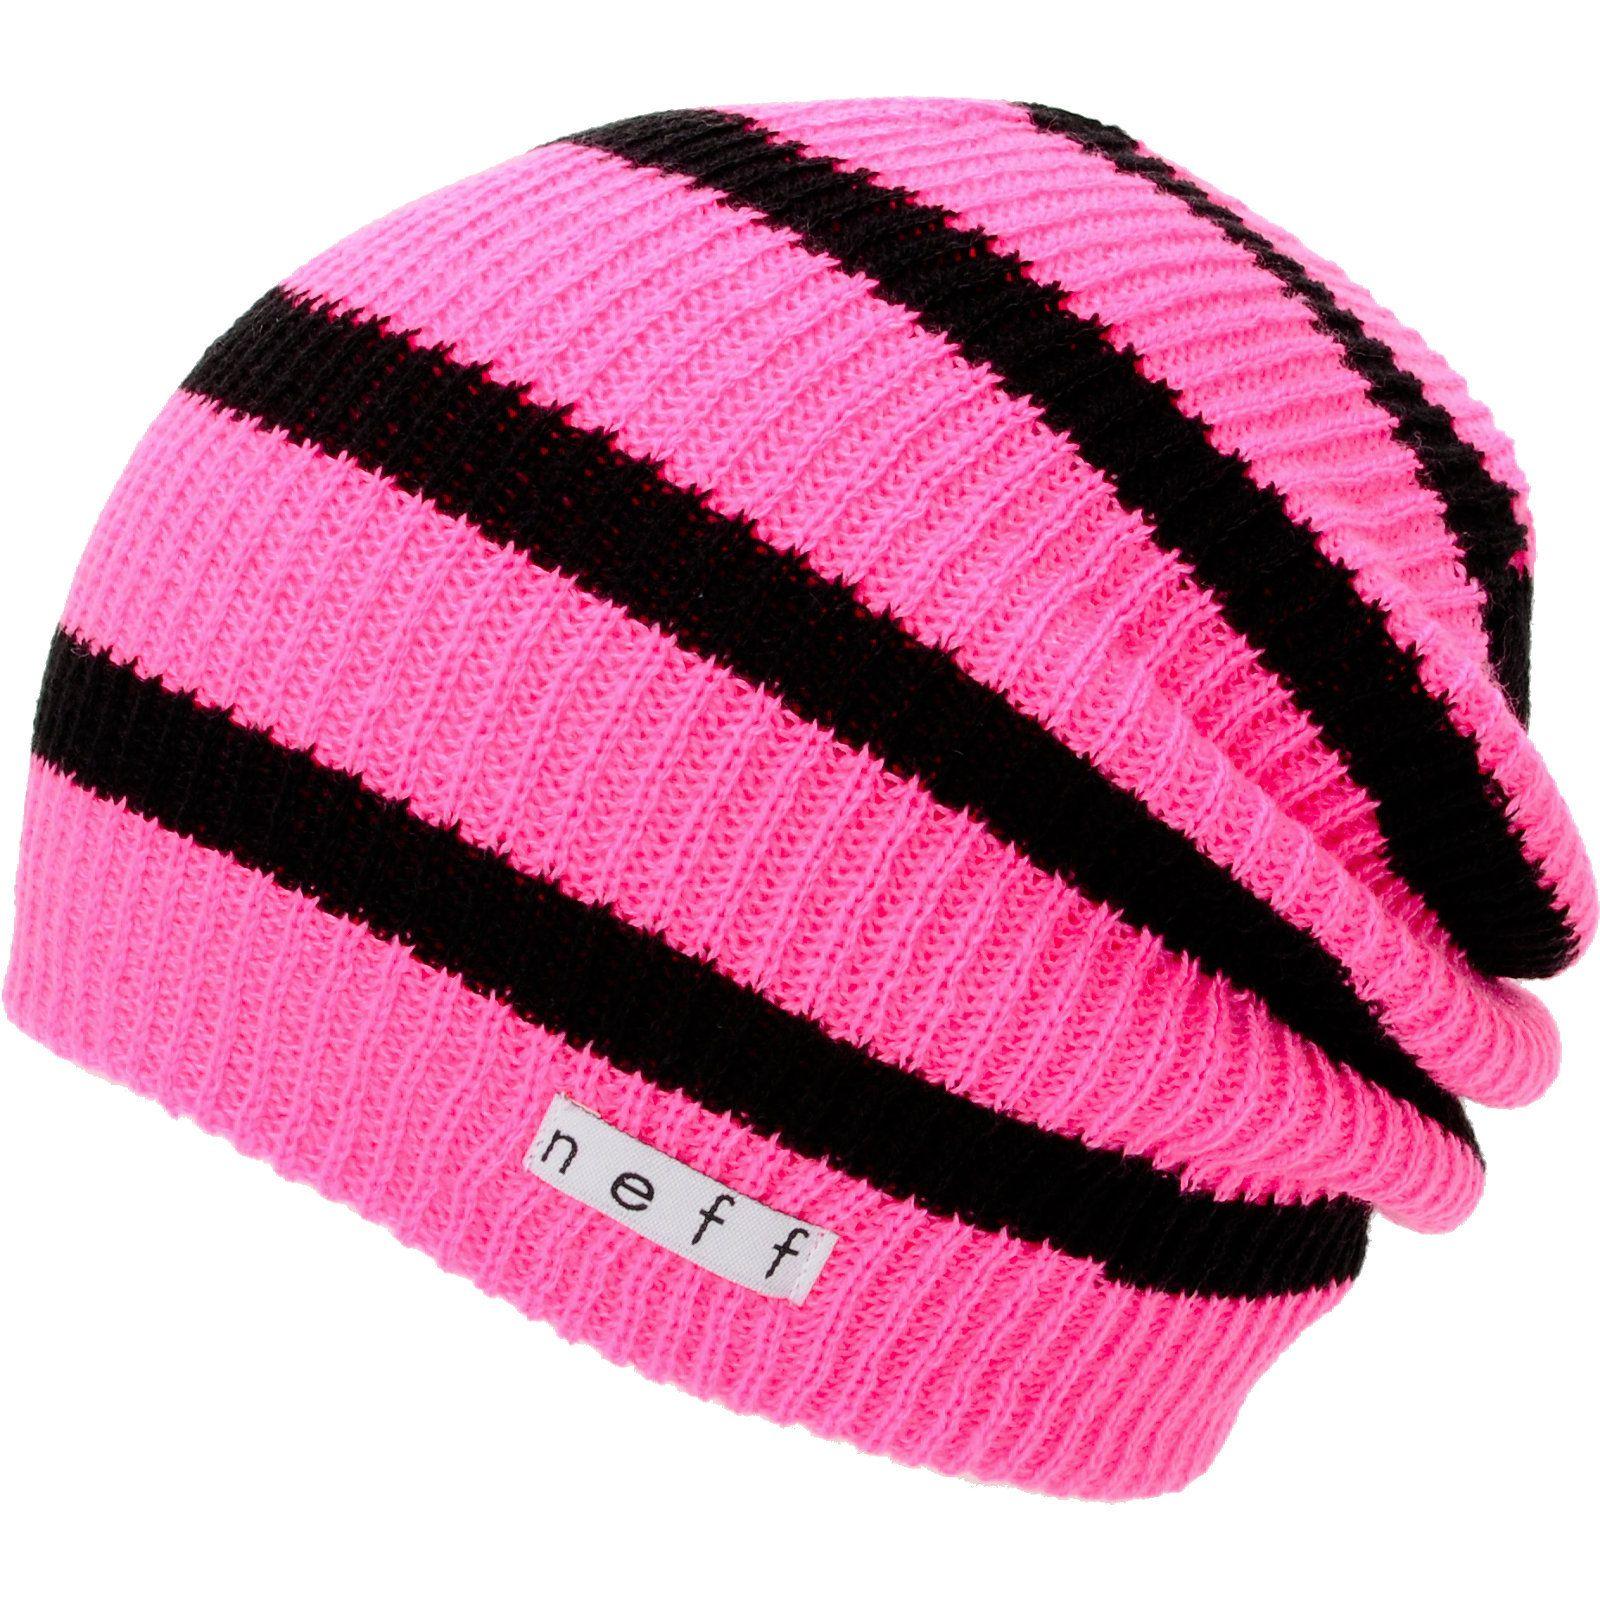 Neff Daily Pink   Black Stripe Beanie at Zumiez   PDP  7105b552025